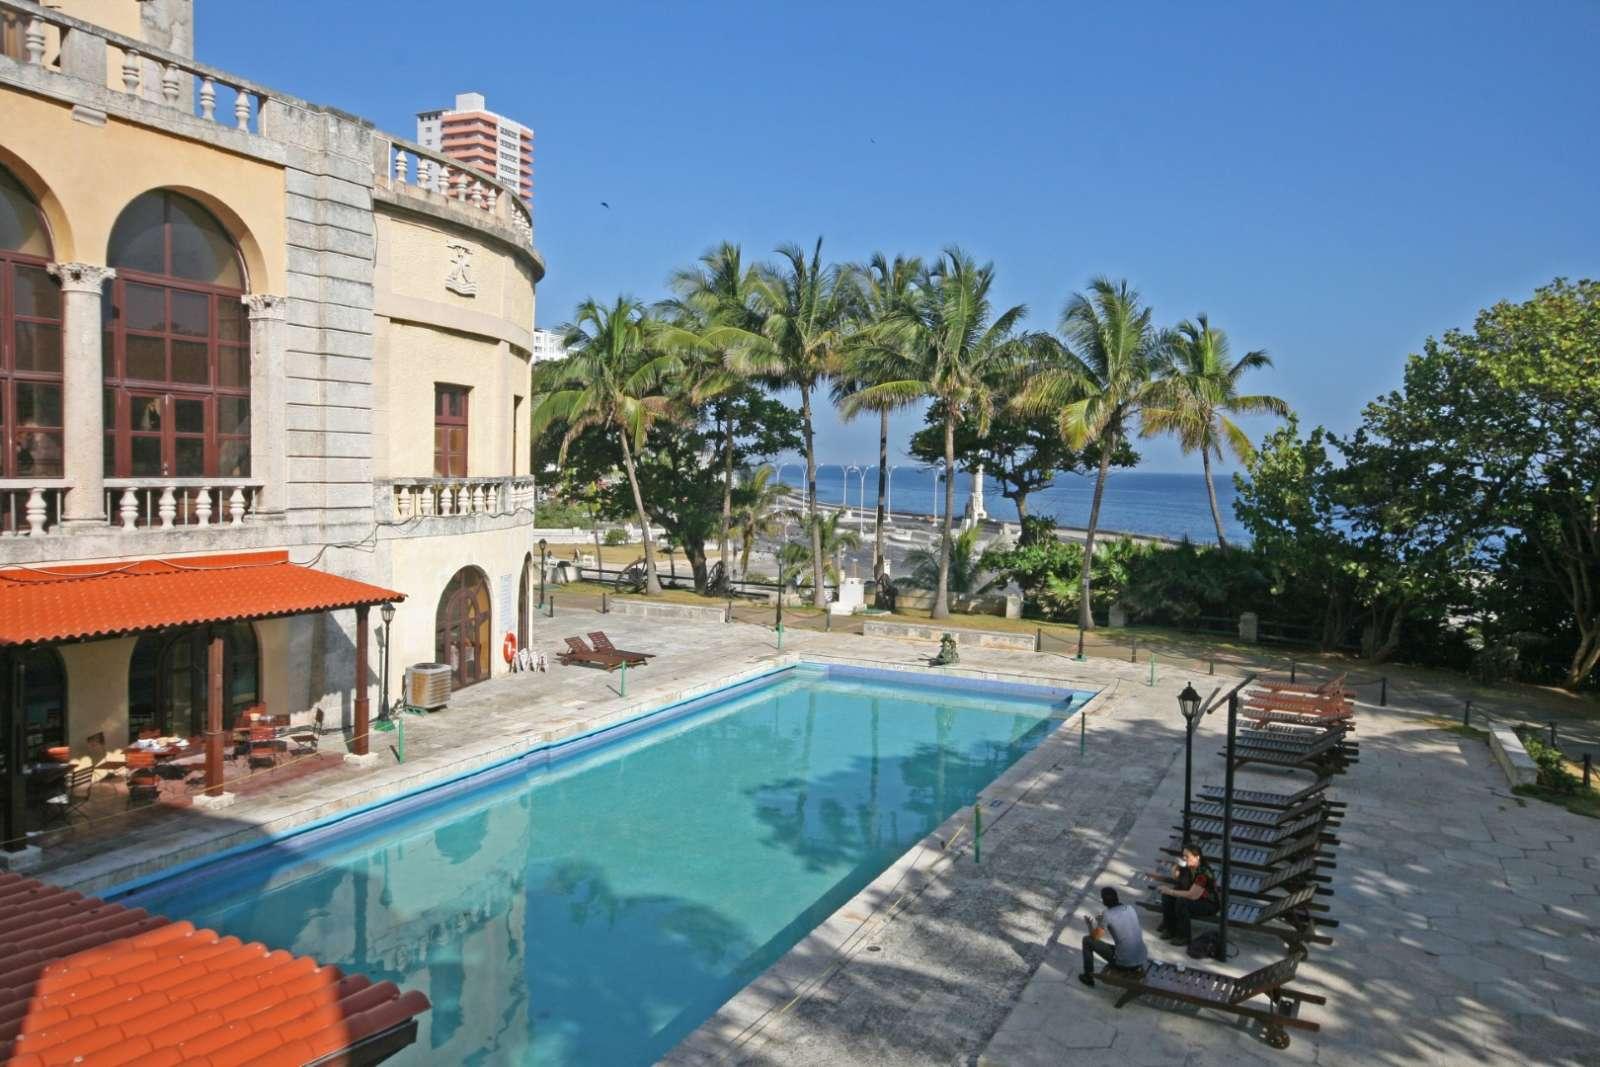 Swimming pool of the Hotel Nacional in Havana